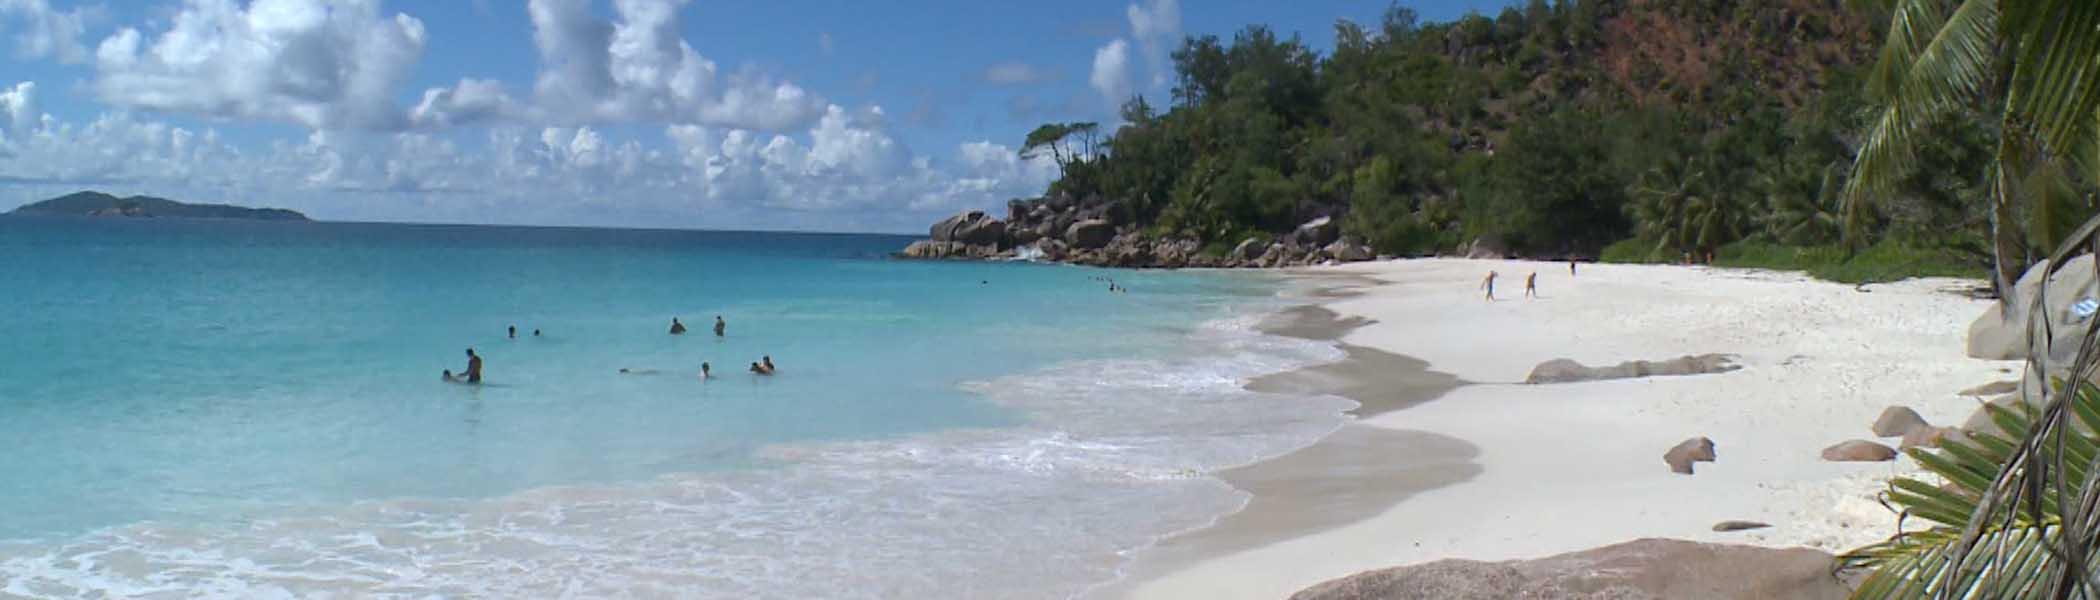 anse-georgette, Beaches in Seychelles Islands